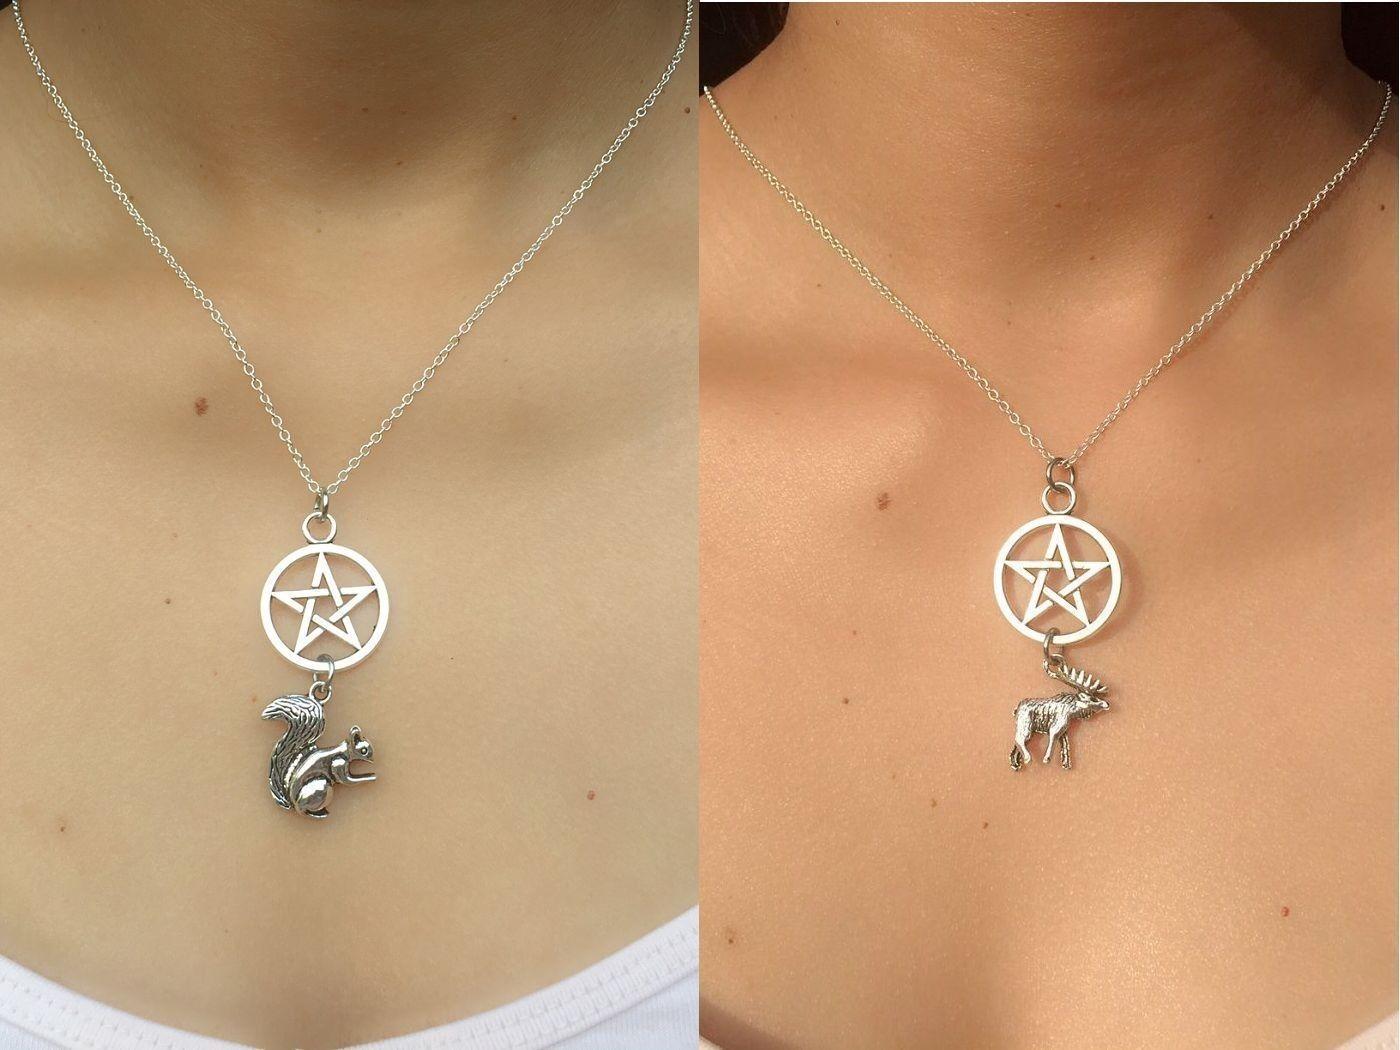 Sam n Dean (Supernatural) Inspired Moose n Squirrel (2) Friendship Necklaces. | eBay